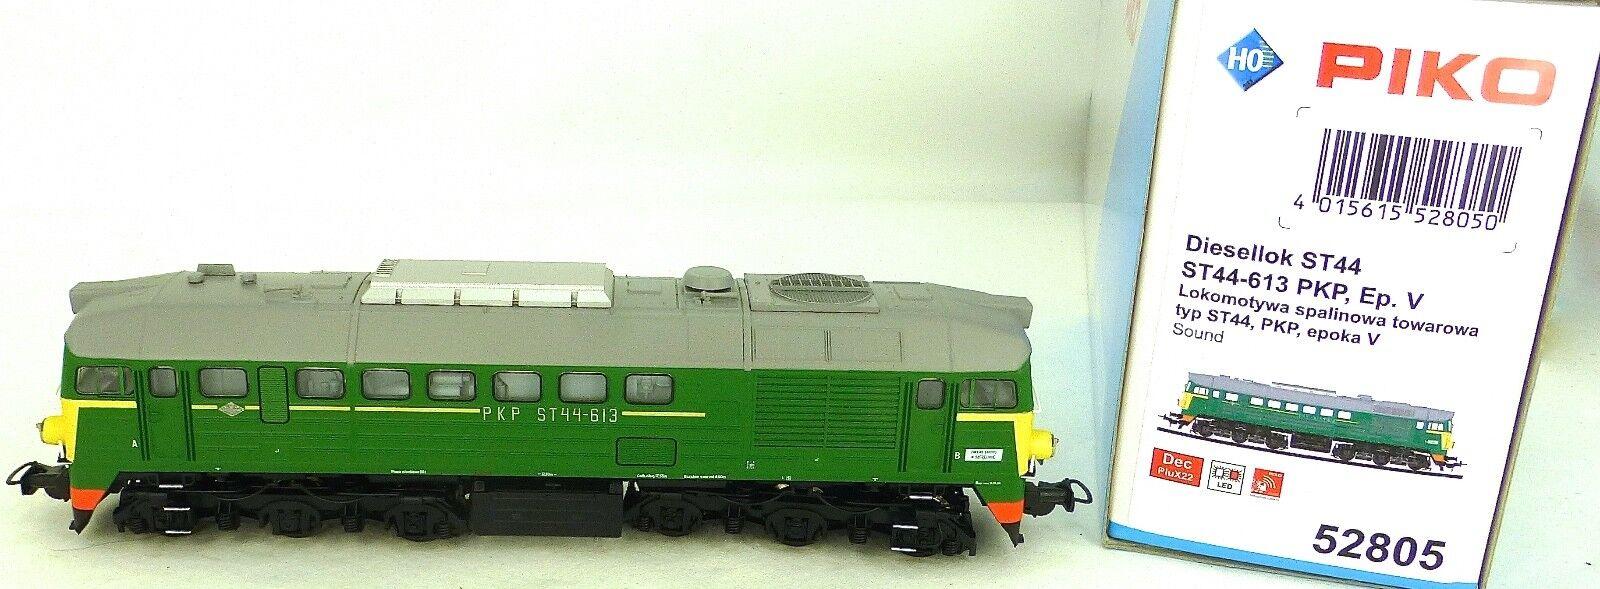 Piko 52805 Pkp ST44-613 Diesel Locomotive Digital Sound PluX22 Ep V H0 1 87 Ovp